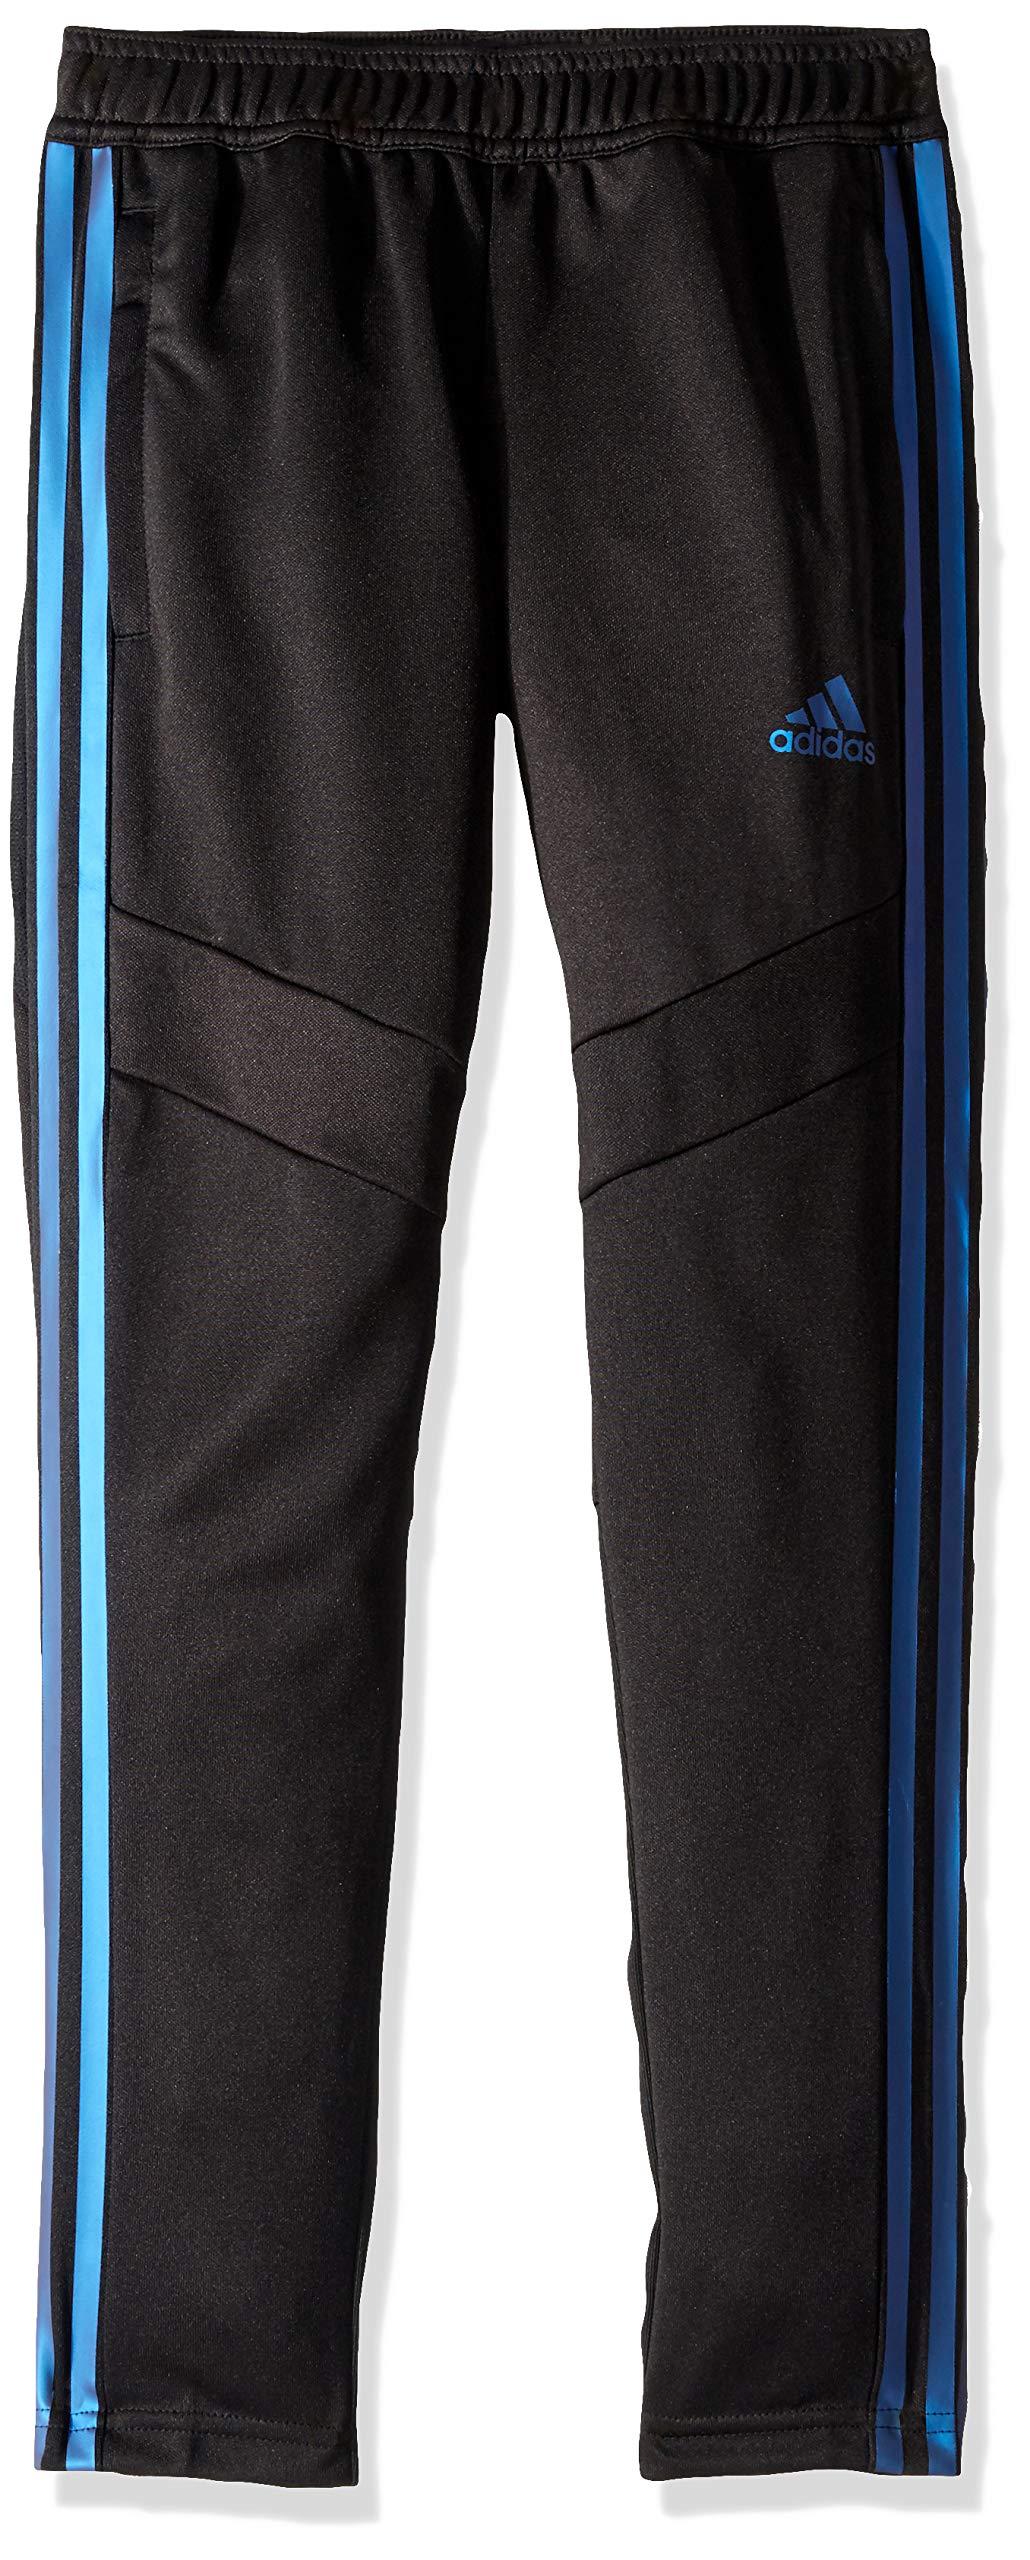 adidas Originals Boys' Big Tiro 19 Pant, Black/Blue Pearl Essence, Small